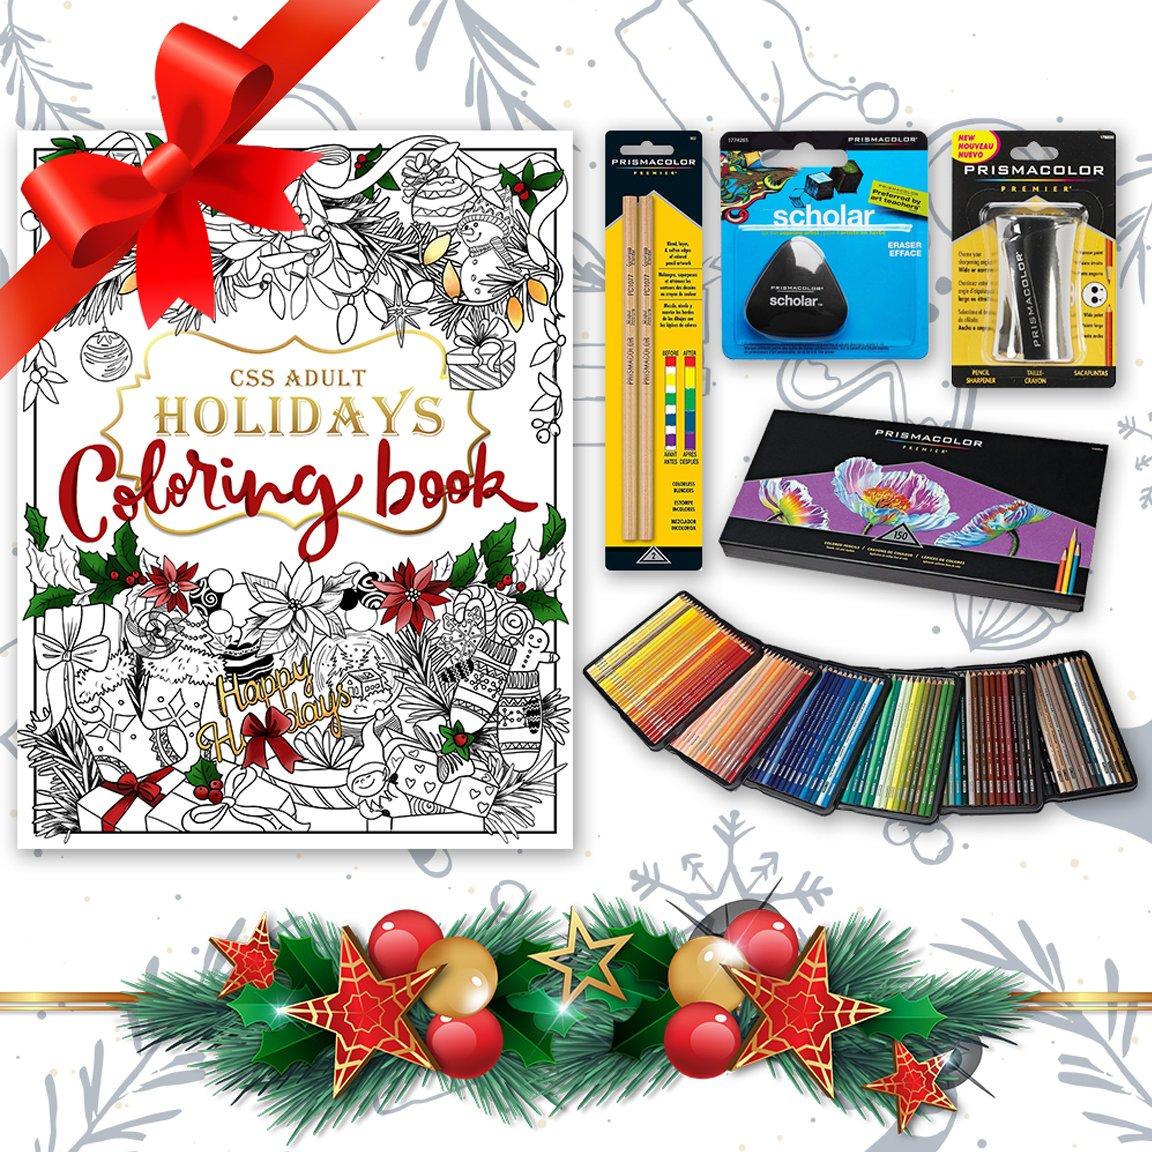 Prismacolor Bundle - 150-Count Colored Pencils, Triangular Scholar Pencil Eraser, Premier Pencil Sharpener, Colorless Blender Pencils, and CSS Adult Coloring Book